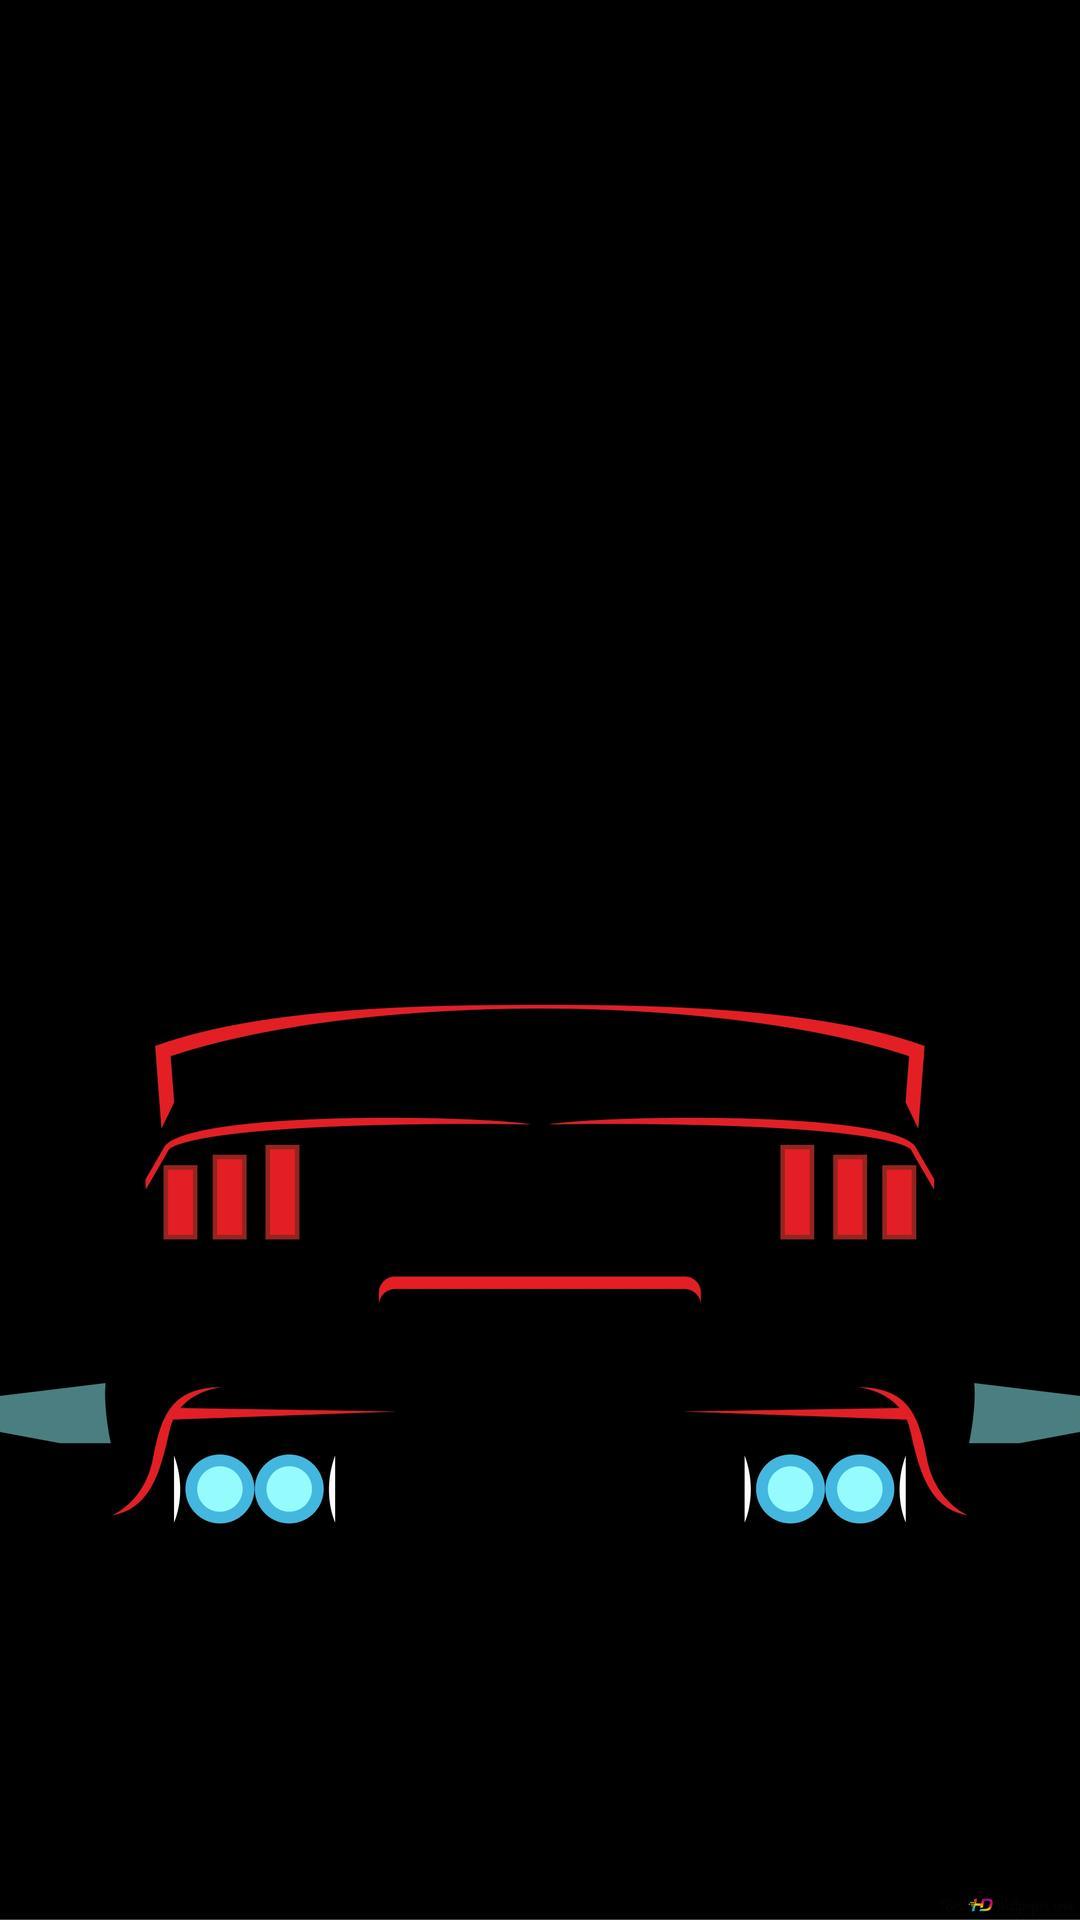 Red Mustang Black Wallpaper Hd Wallpaper Download